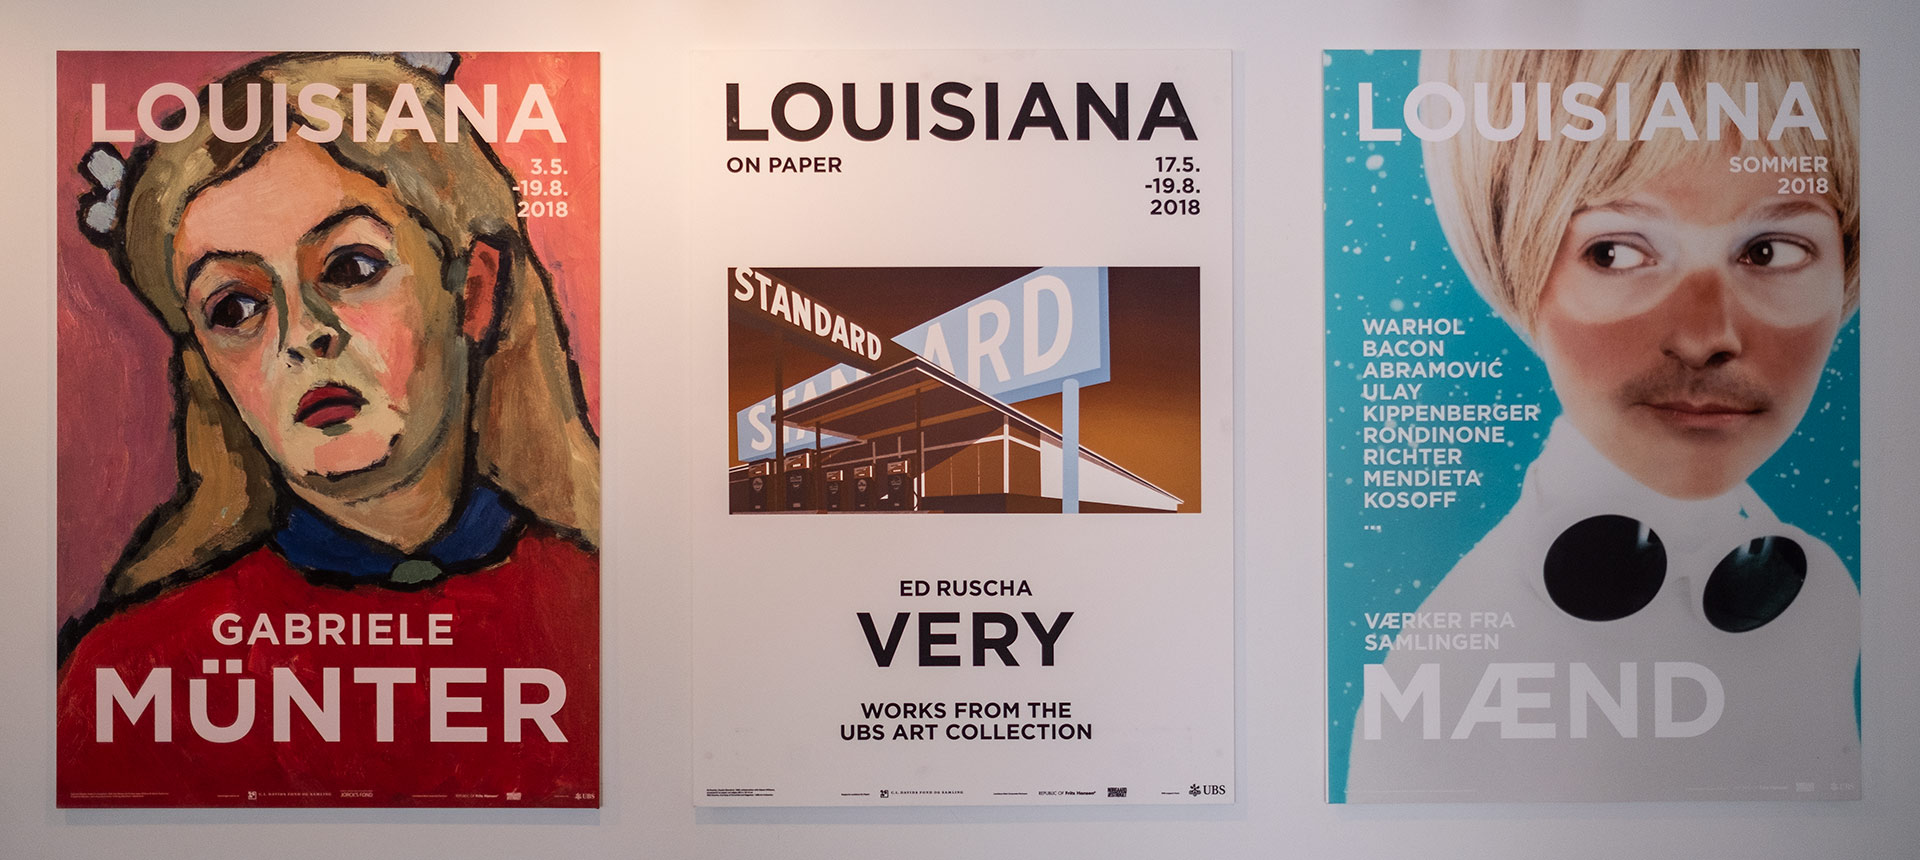 En liten roadtrip till Louisiana museum of modern art |©Janne A